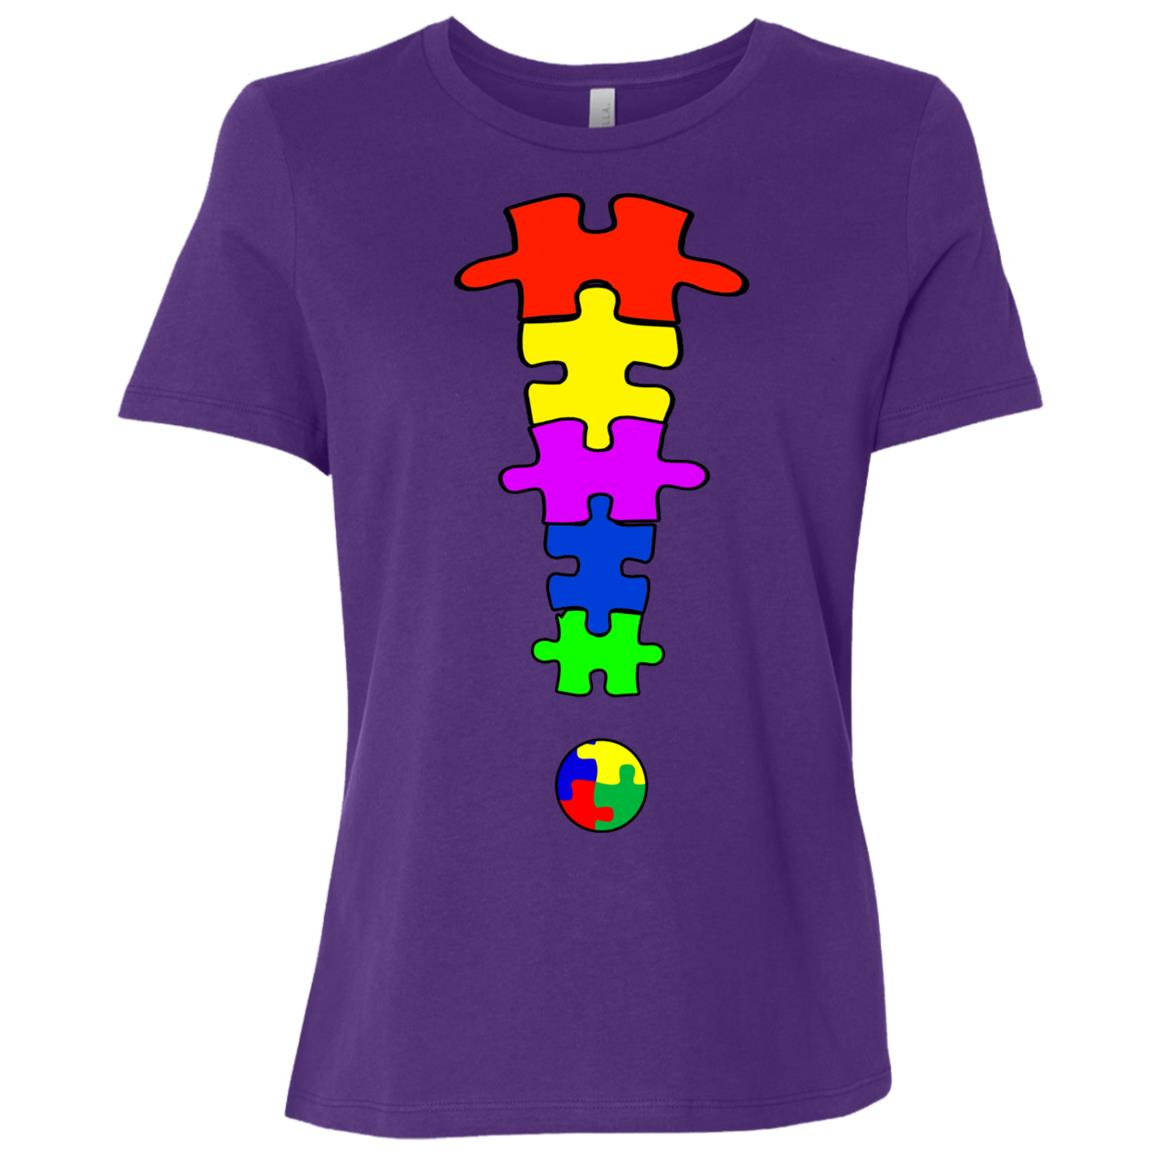 Autism Puzzle – Autism Awarenesss Women Short Sleeve T-Shirt